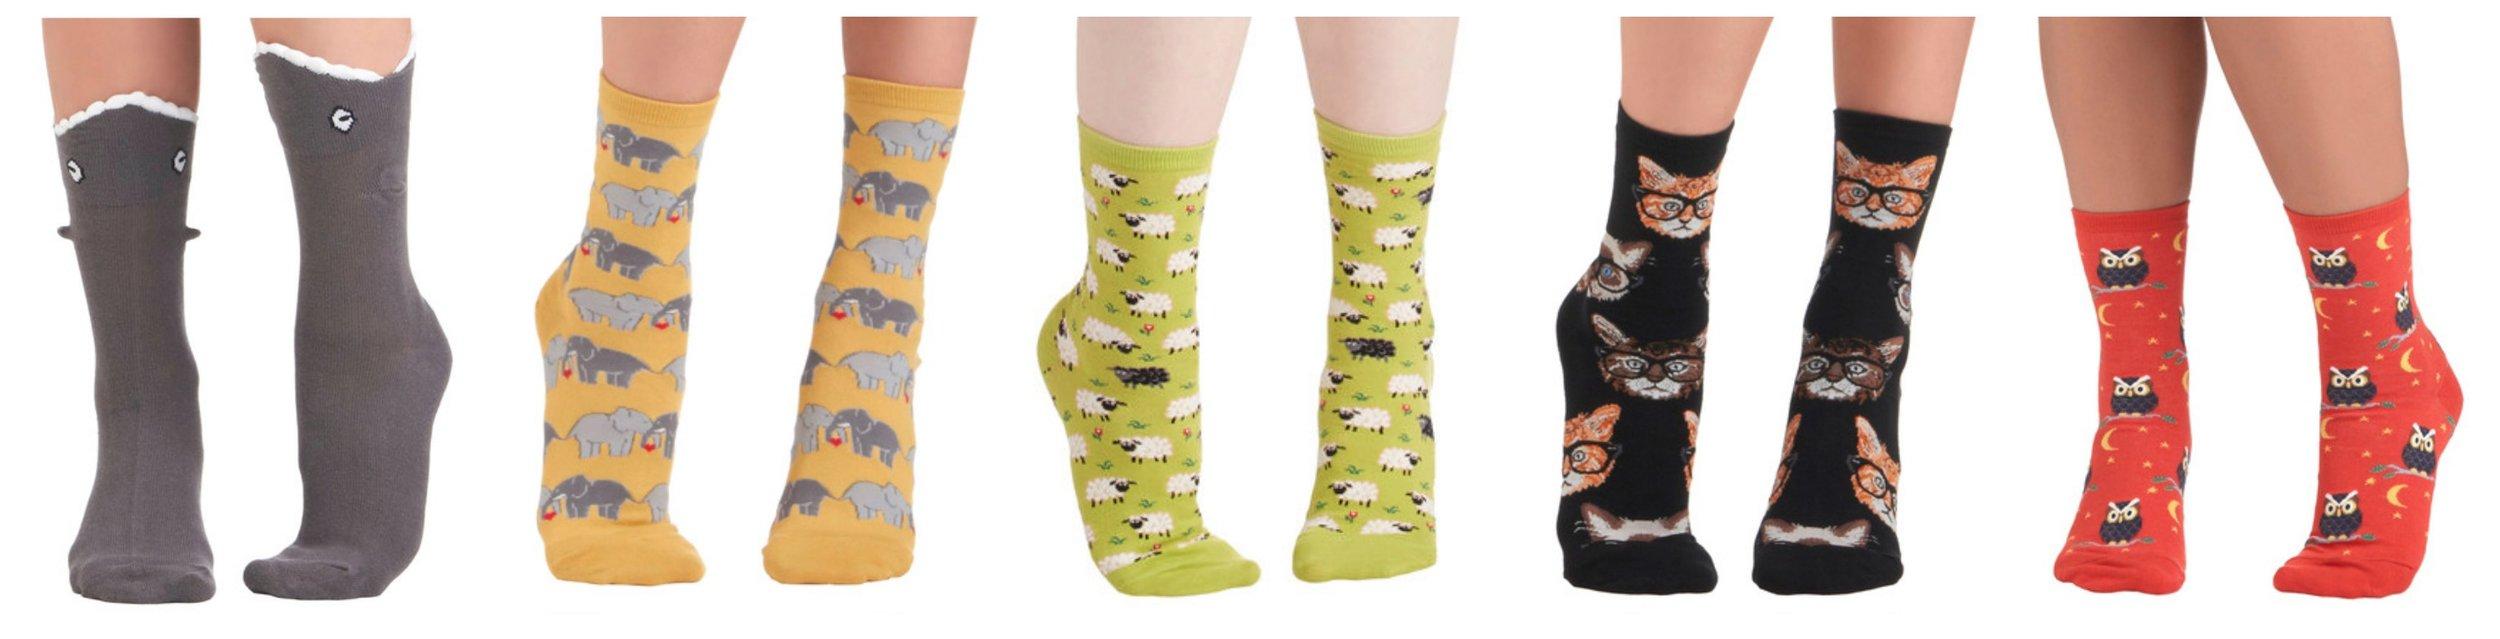 ModCloth Socks